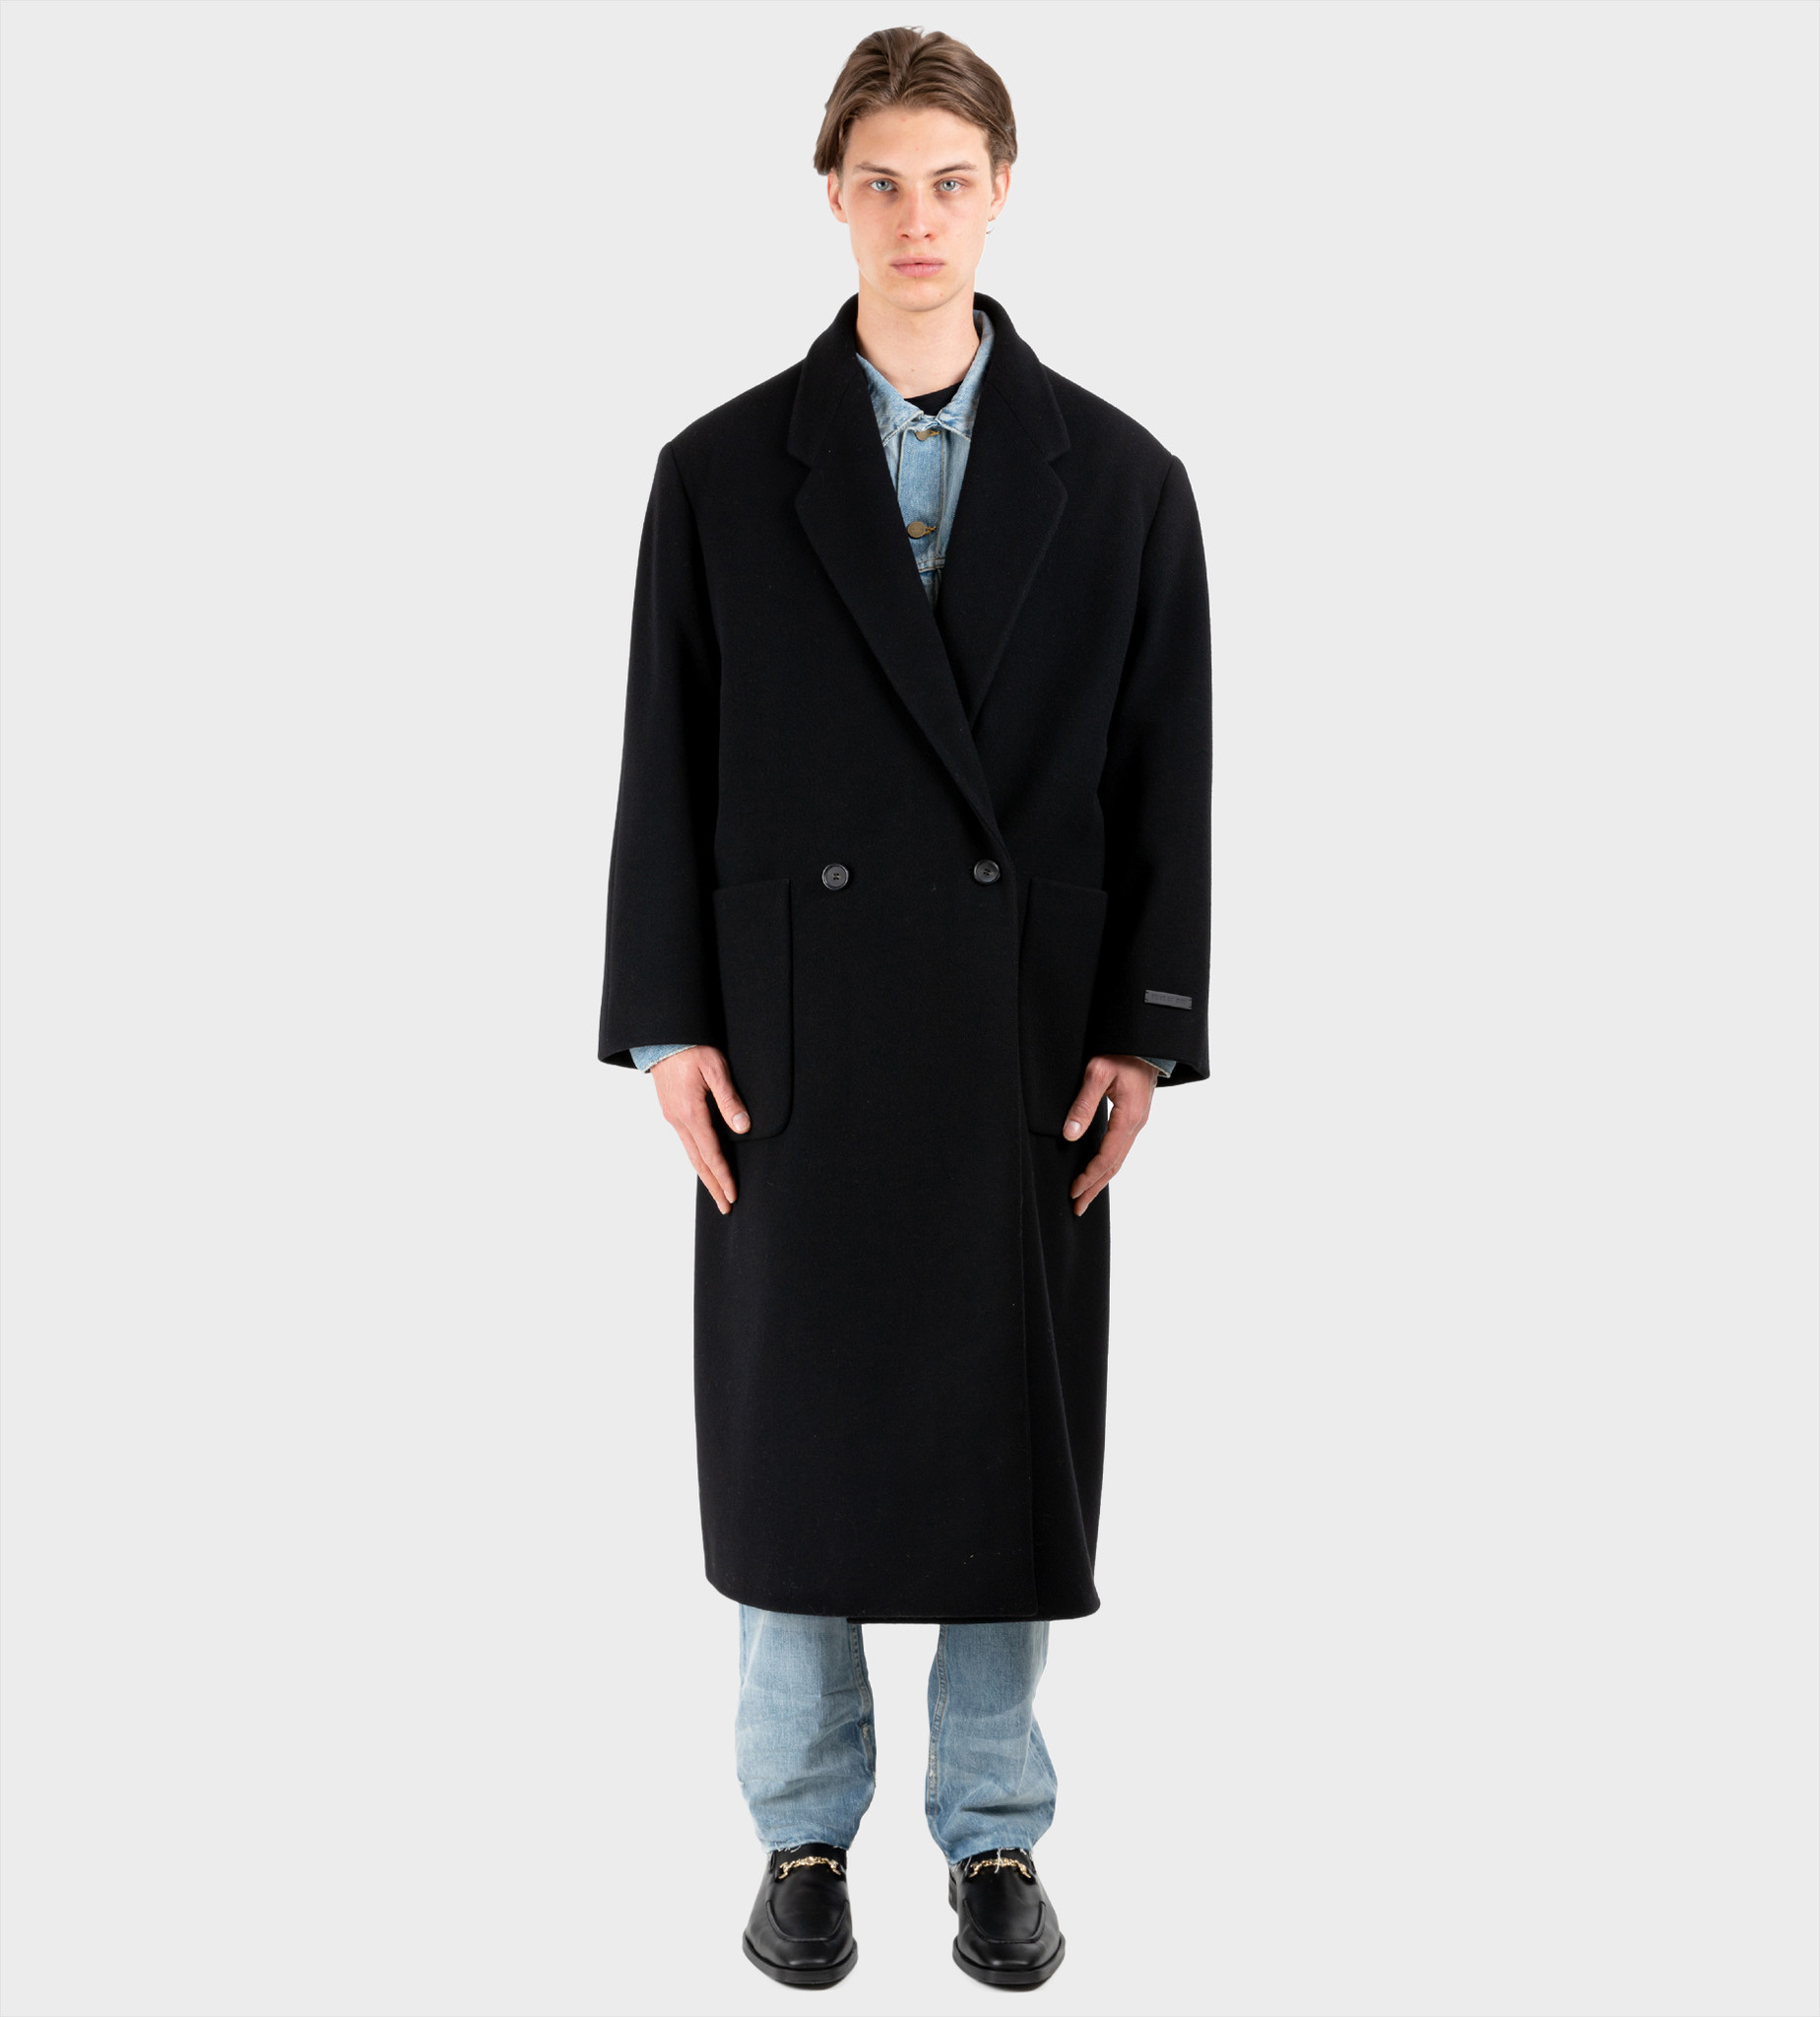 FEAR OF GOD The Overcoat Black